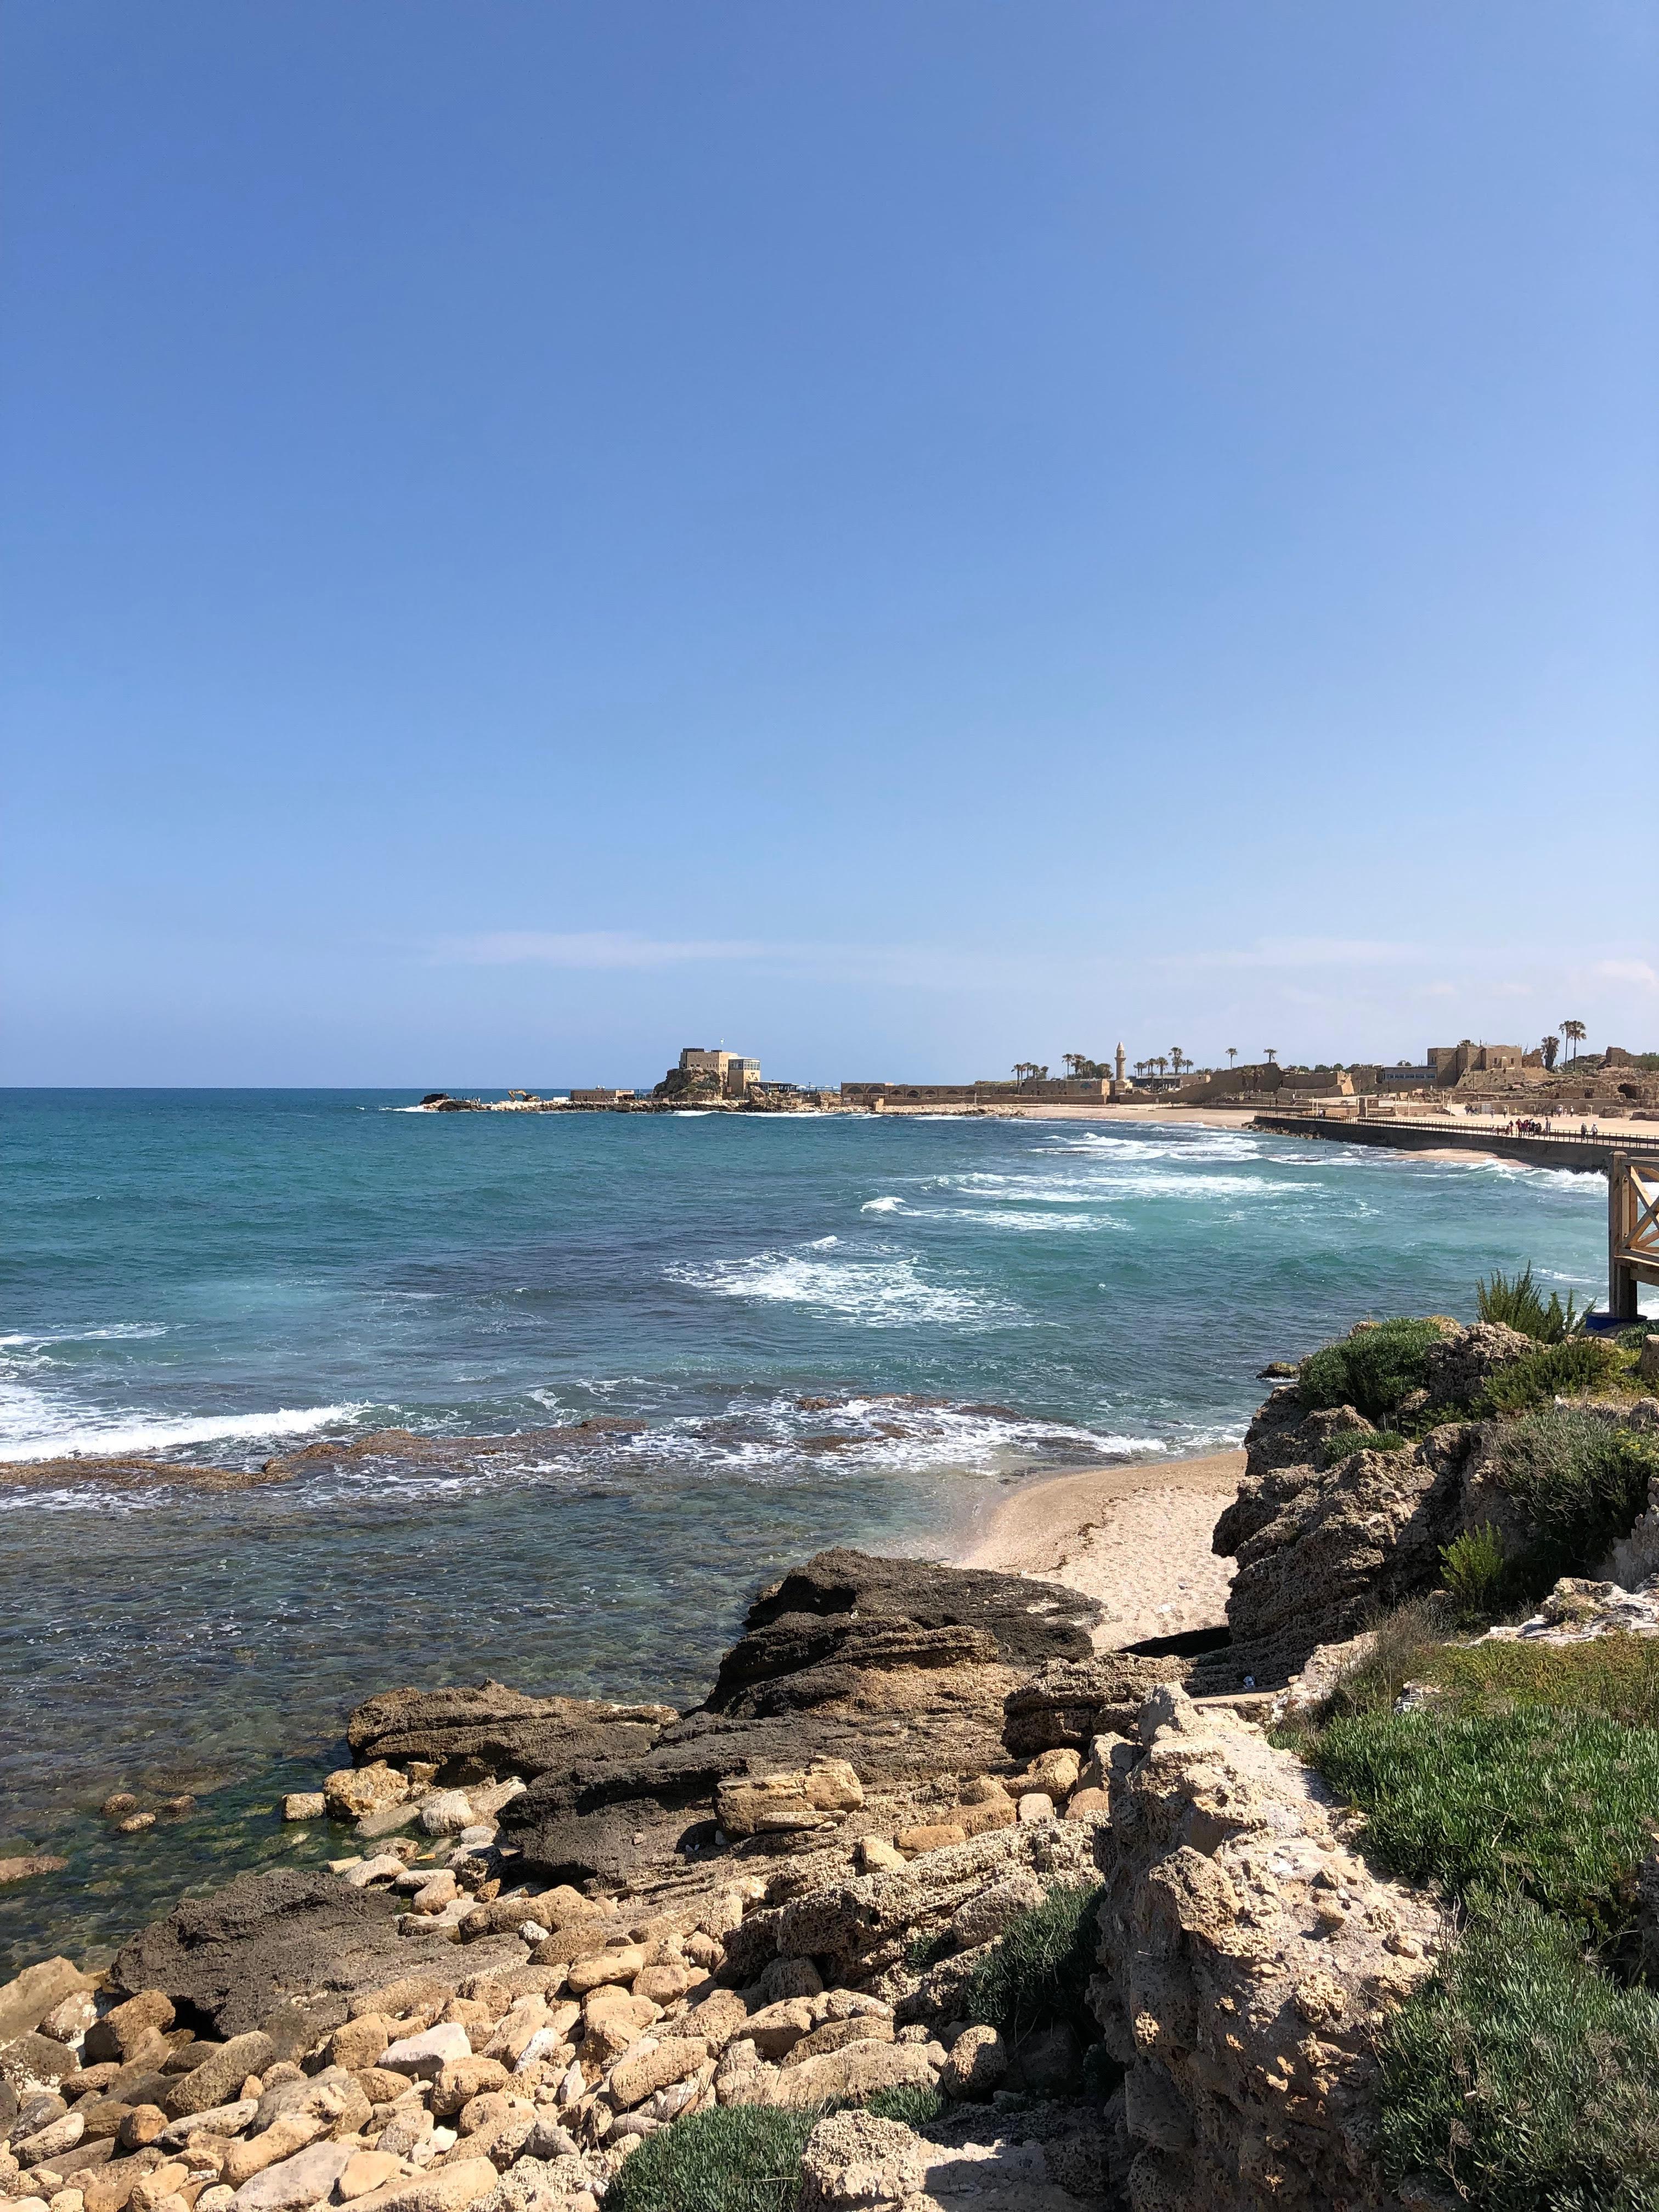 Caesarea, Megiddo, and The Sea of Galilee